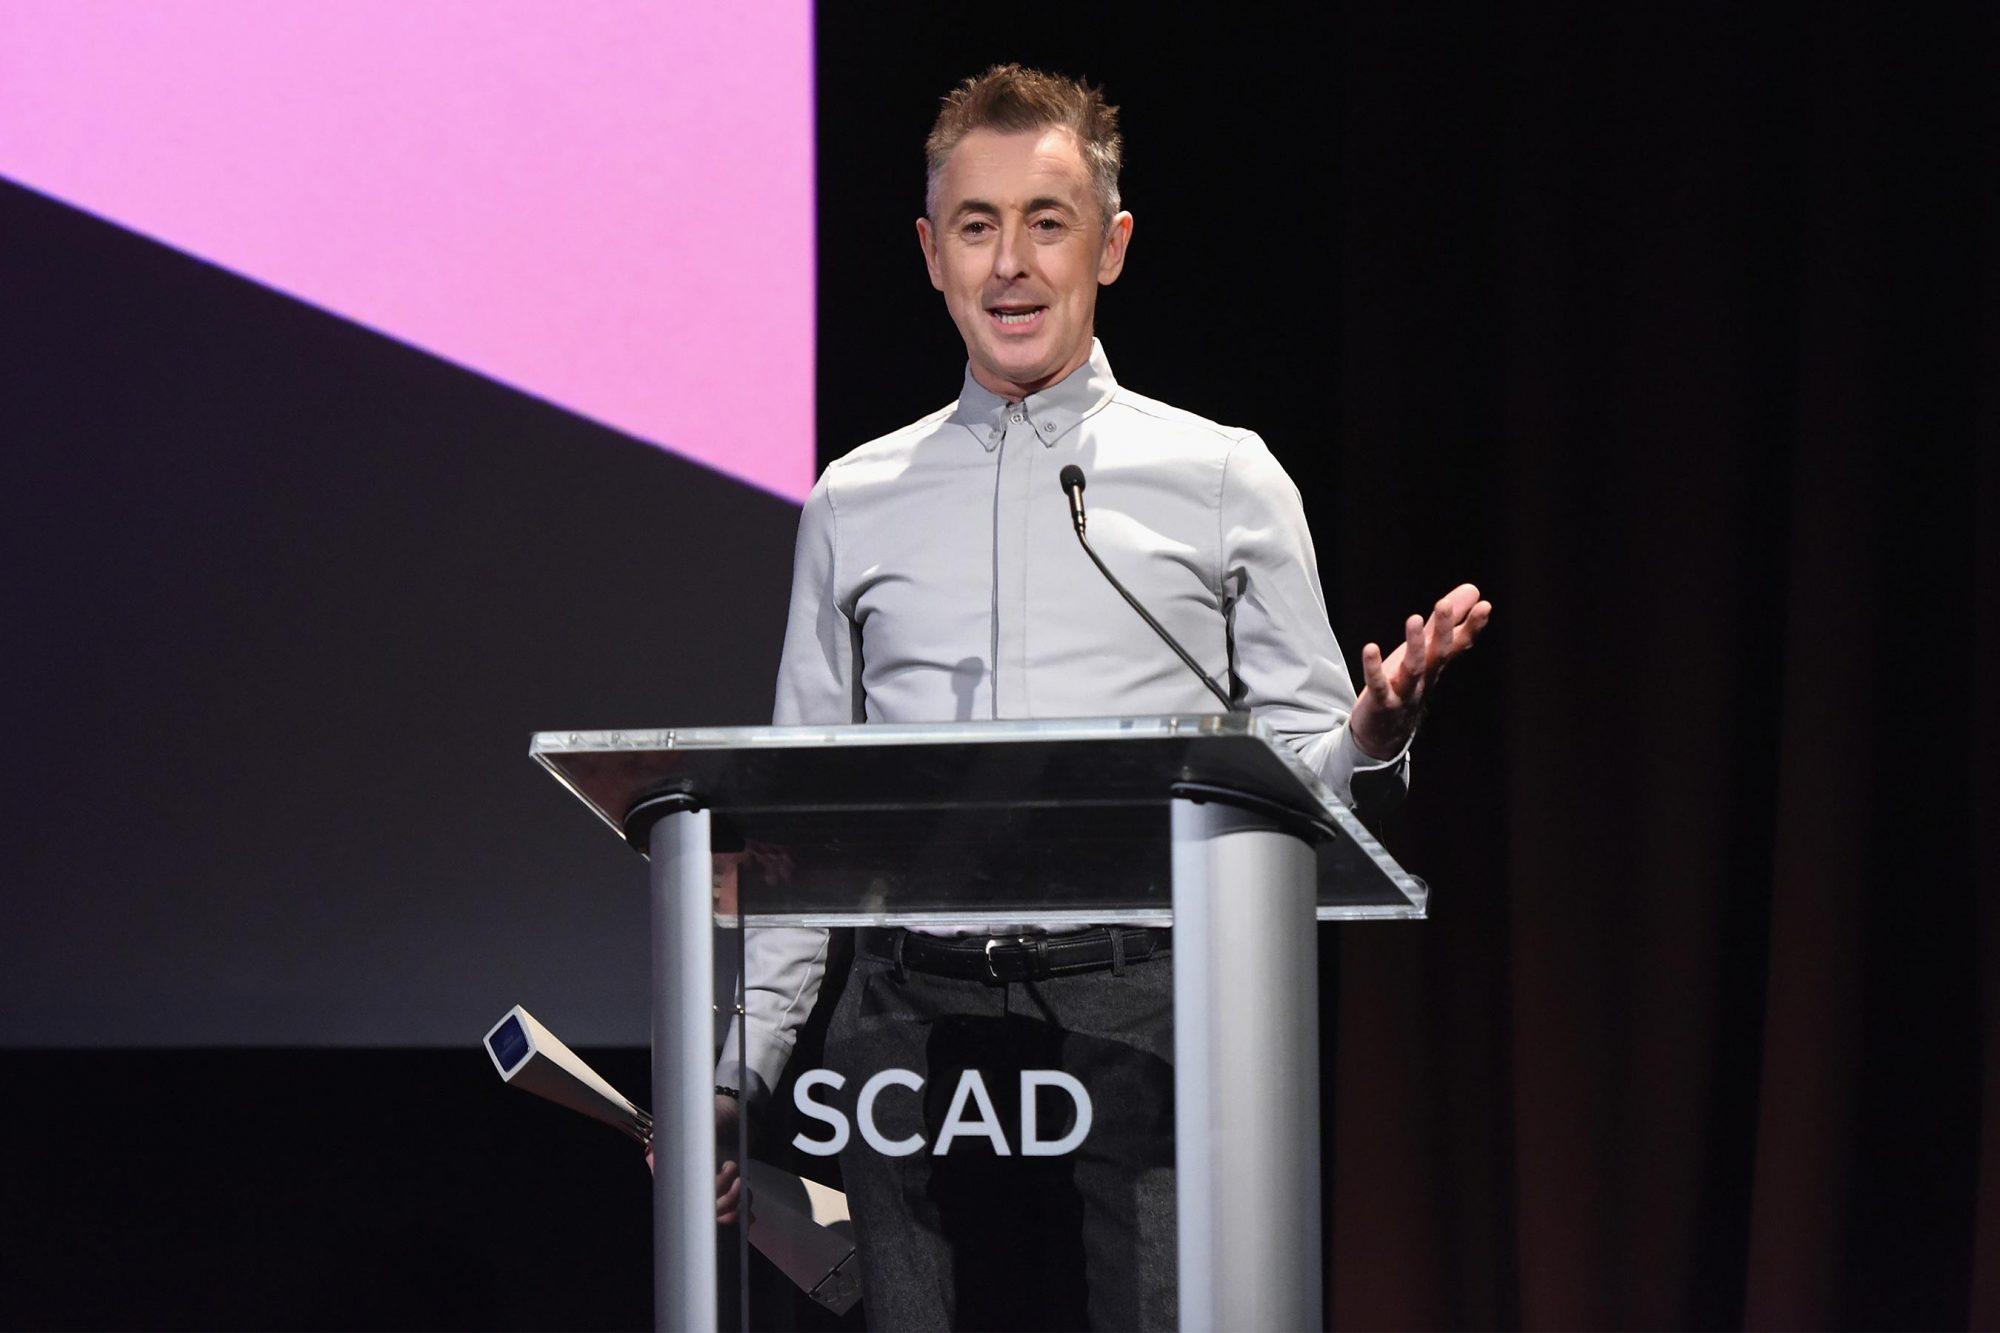 SCAD aTVfest 2018 - Icon Award Presentation, Alan Cumming